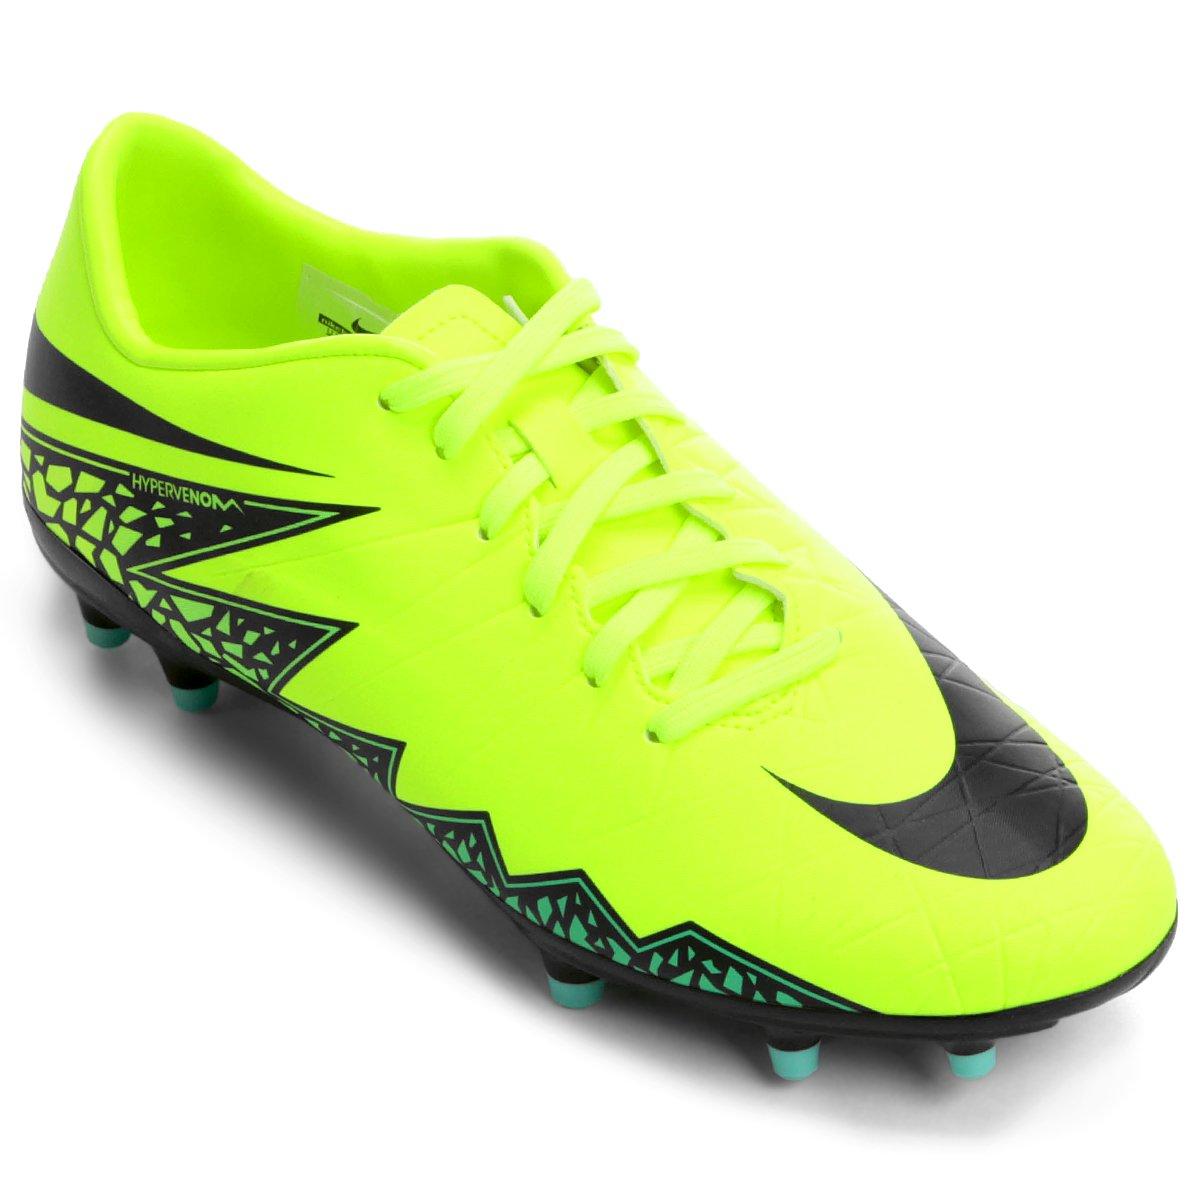 986cc33a0c Chuteira Campo Nike Hypervenom Phelon 2 FG